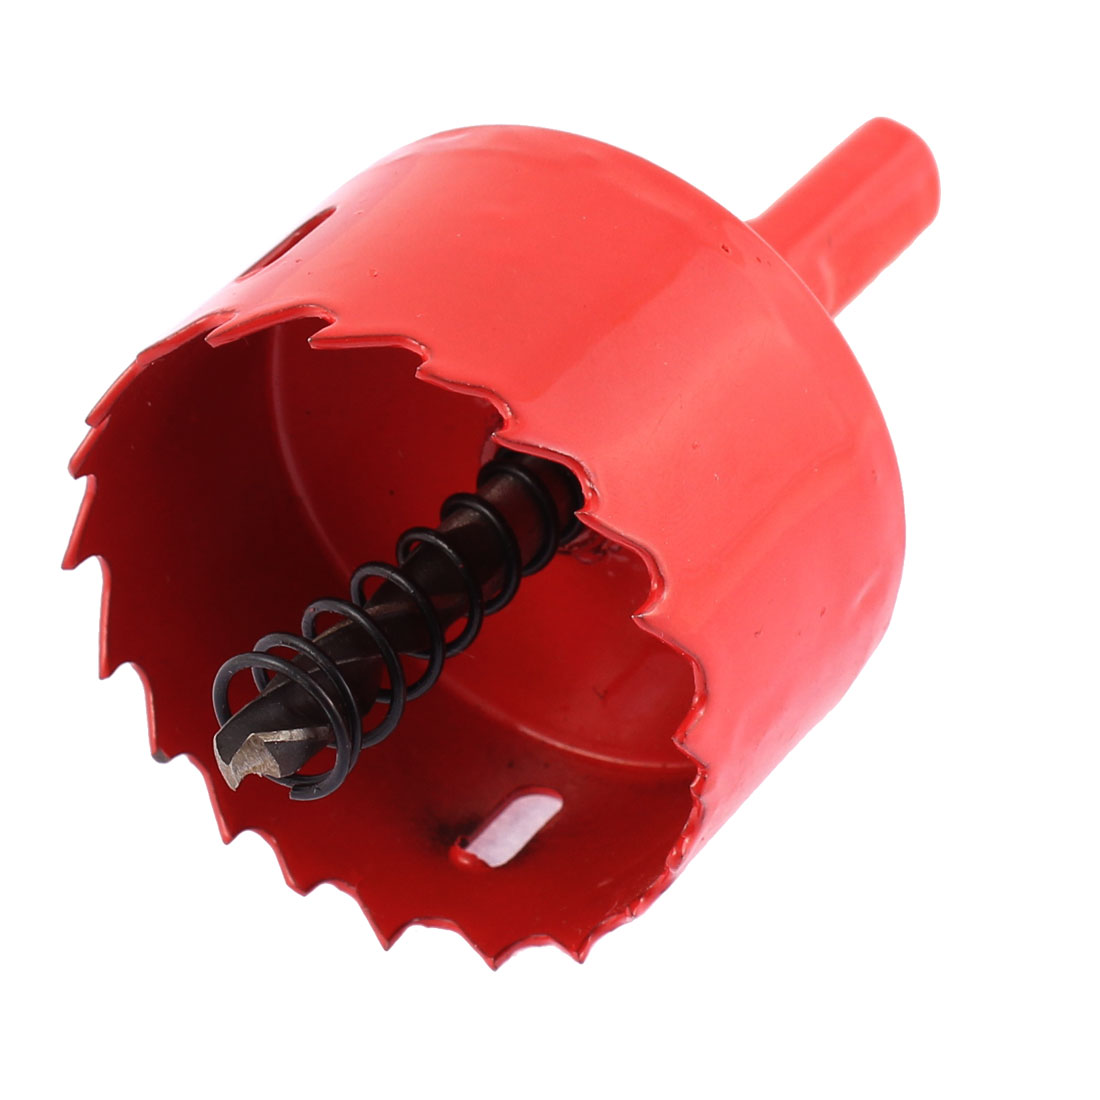 "HSS 50mm 2"" Diameter Wood Aluminum Alloy Drilling Cutting Tool Bimetal Hole Saw Cutter Red"